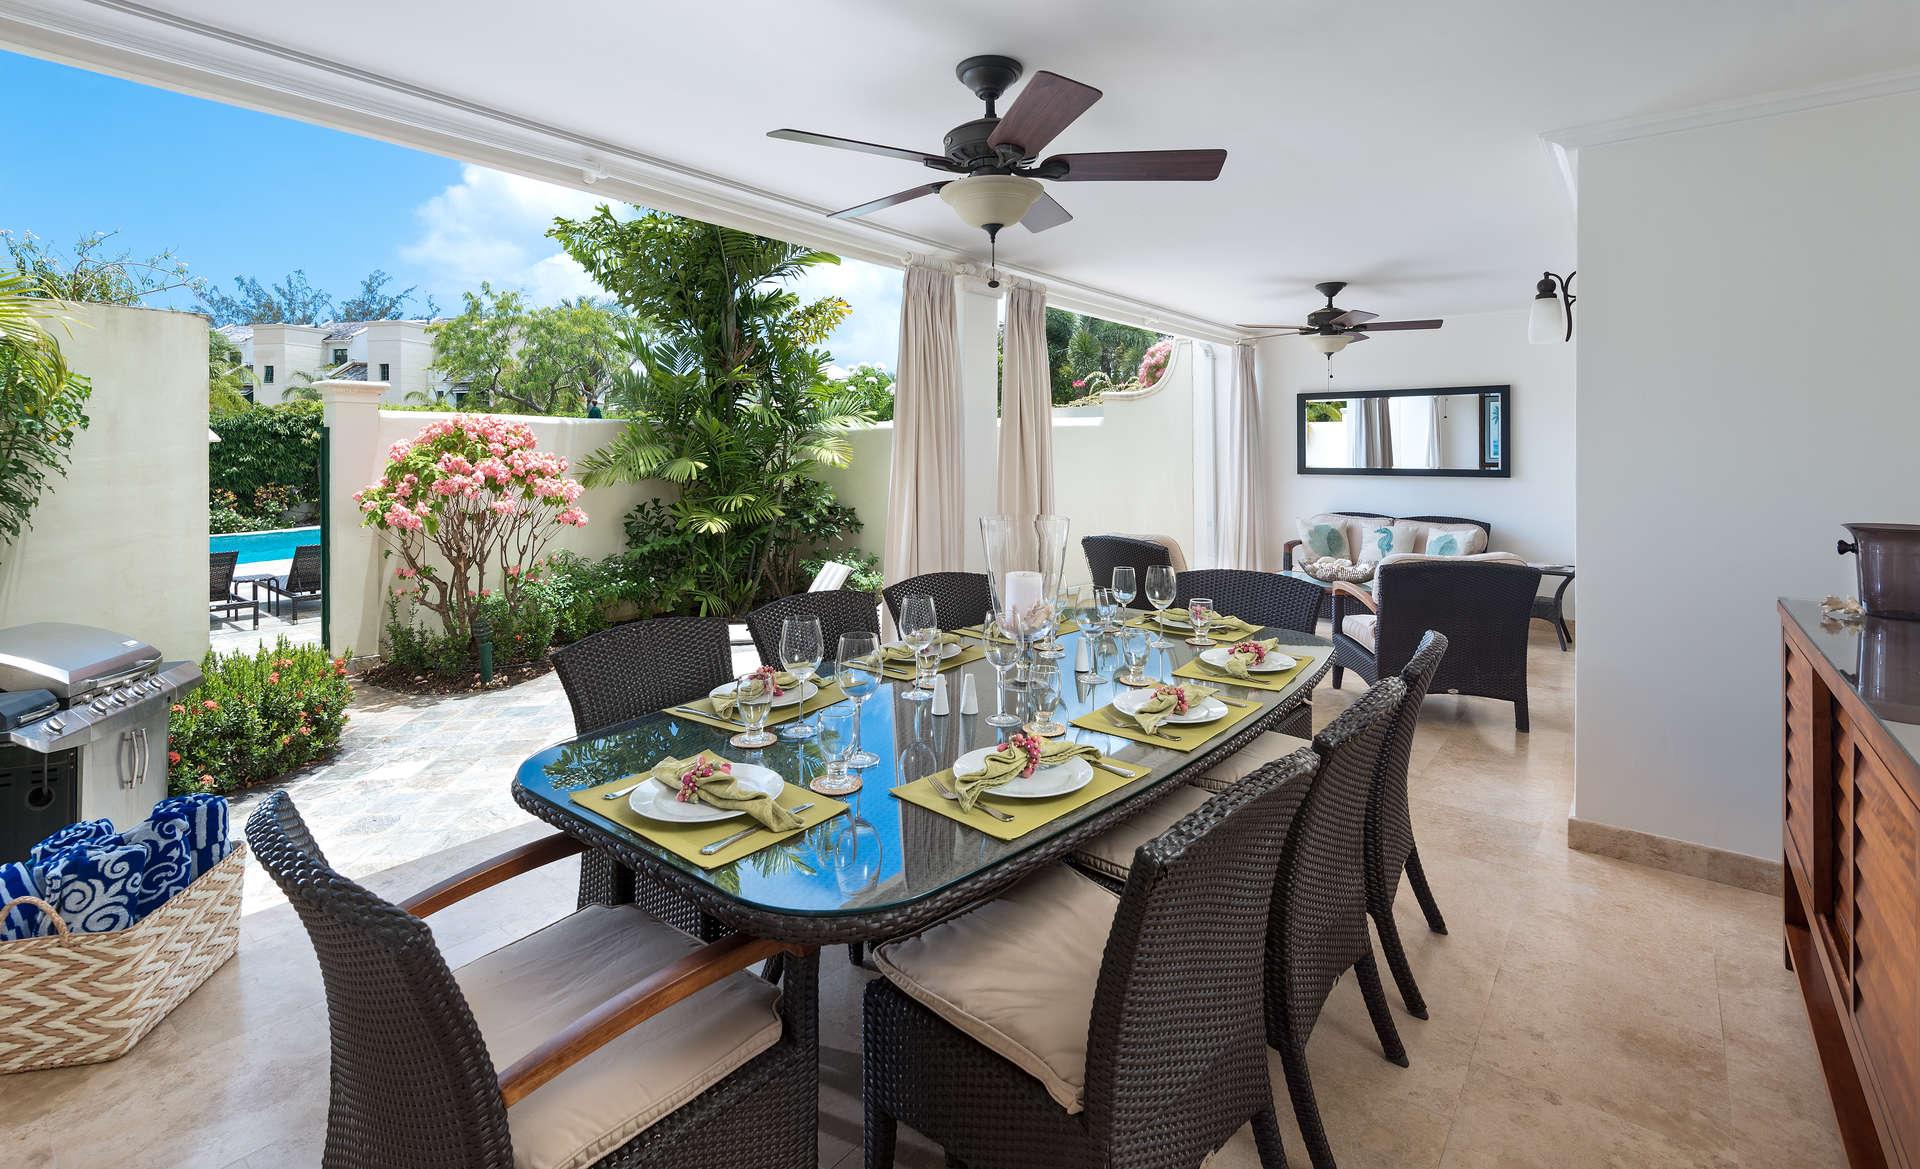 Luxury villa rentals caribbean - Barbados - St peter - Mullins - Mullins View - Image 1/11